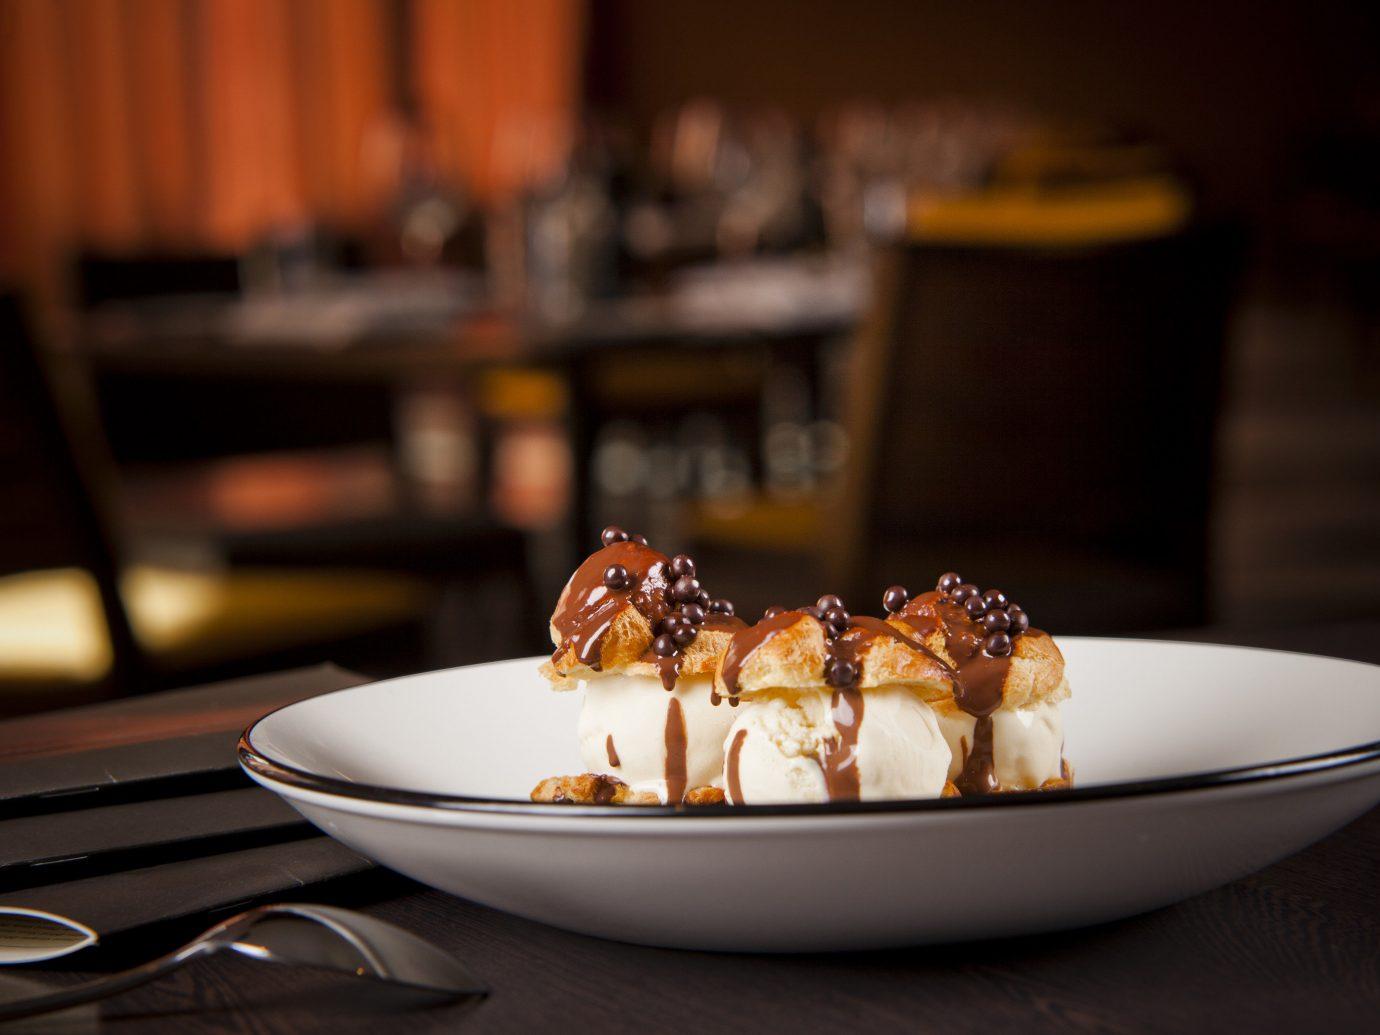 Hotels Romance table plate dessert indoor food dish cuisine tableware breakfast flavor brunch appetizer meal eaten